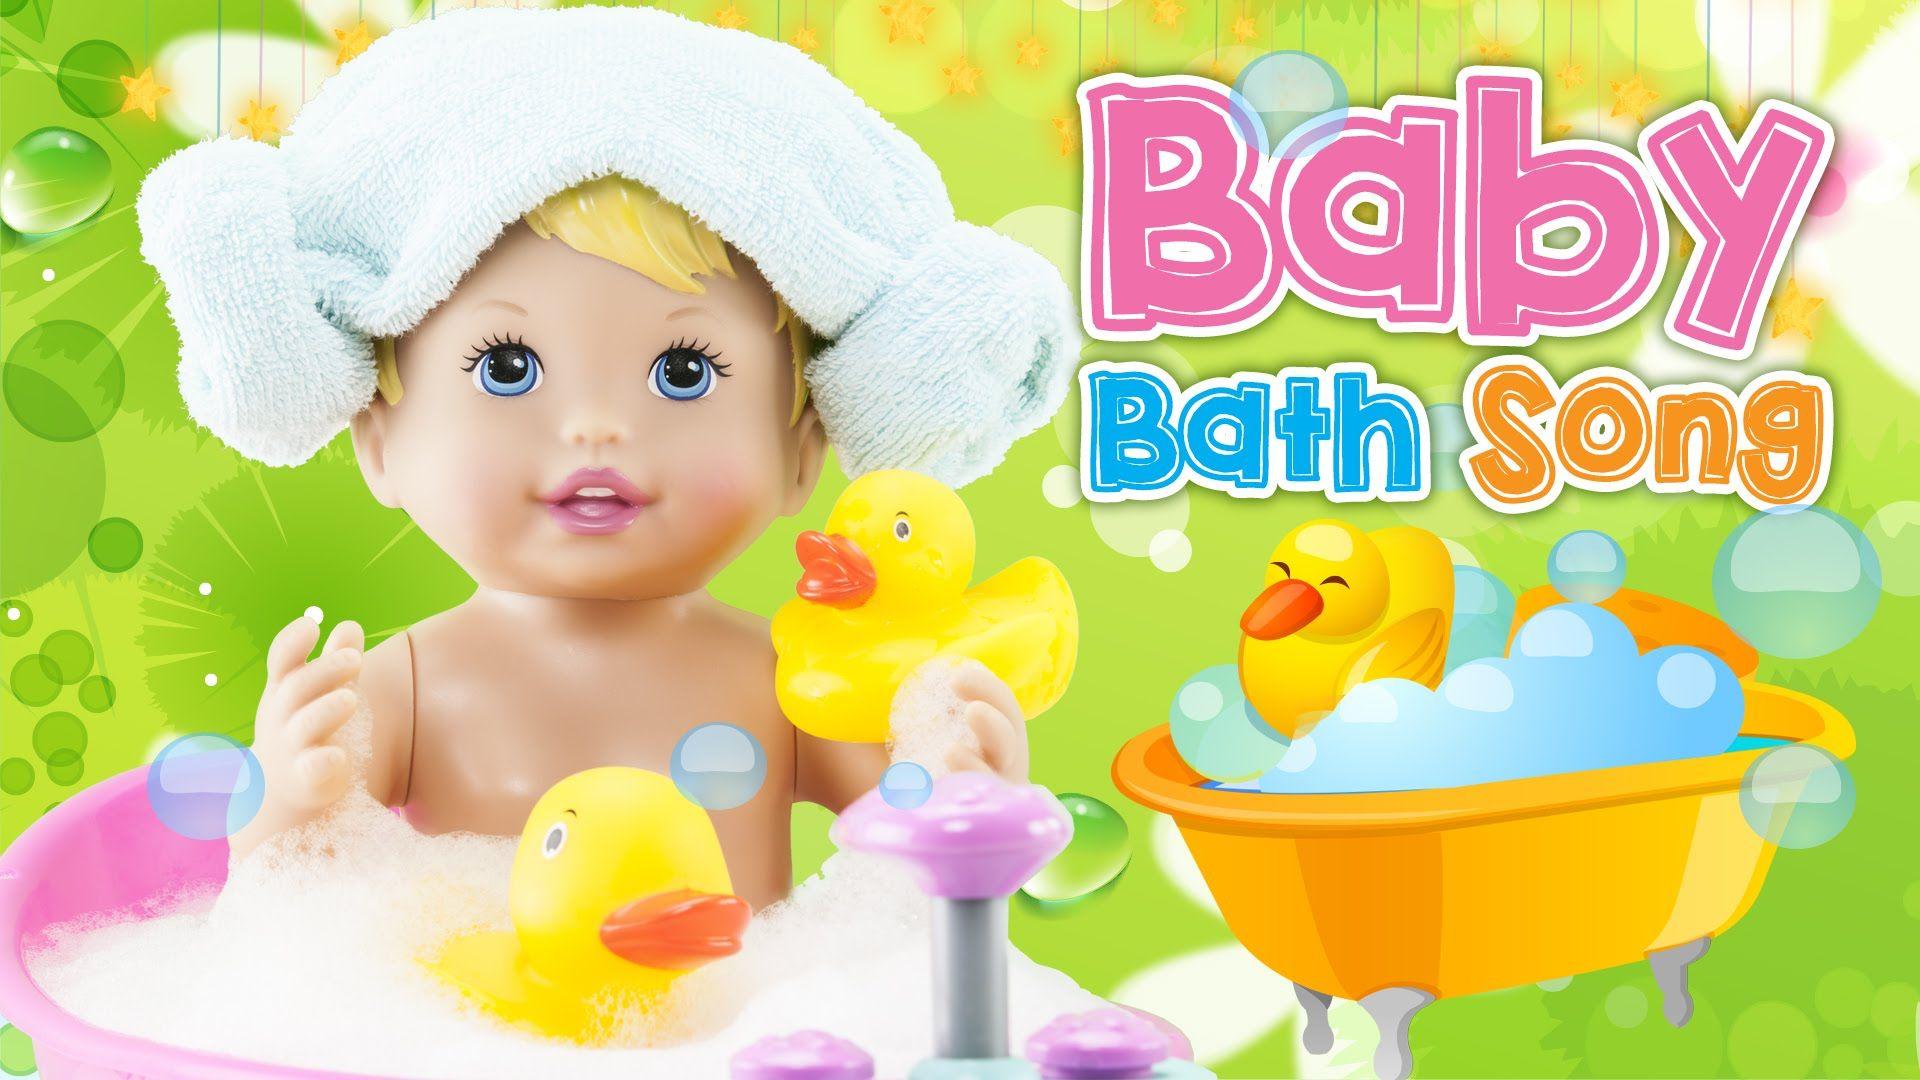 ecaa9fa9b HD ♥ New Bath Song ♥ How to Bath Baby Doll Bathtime Toy Video ♥ Nursery .